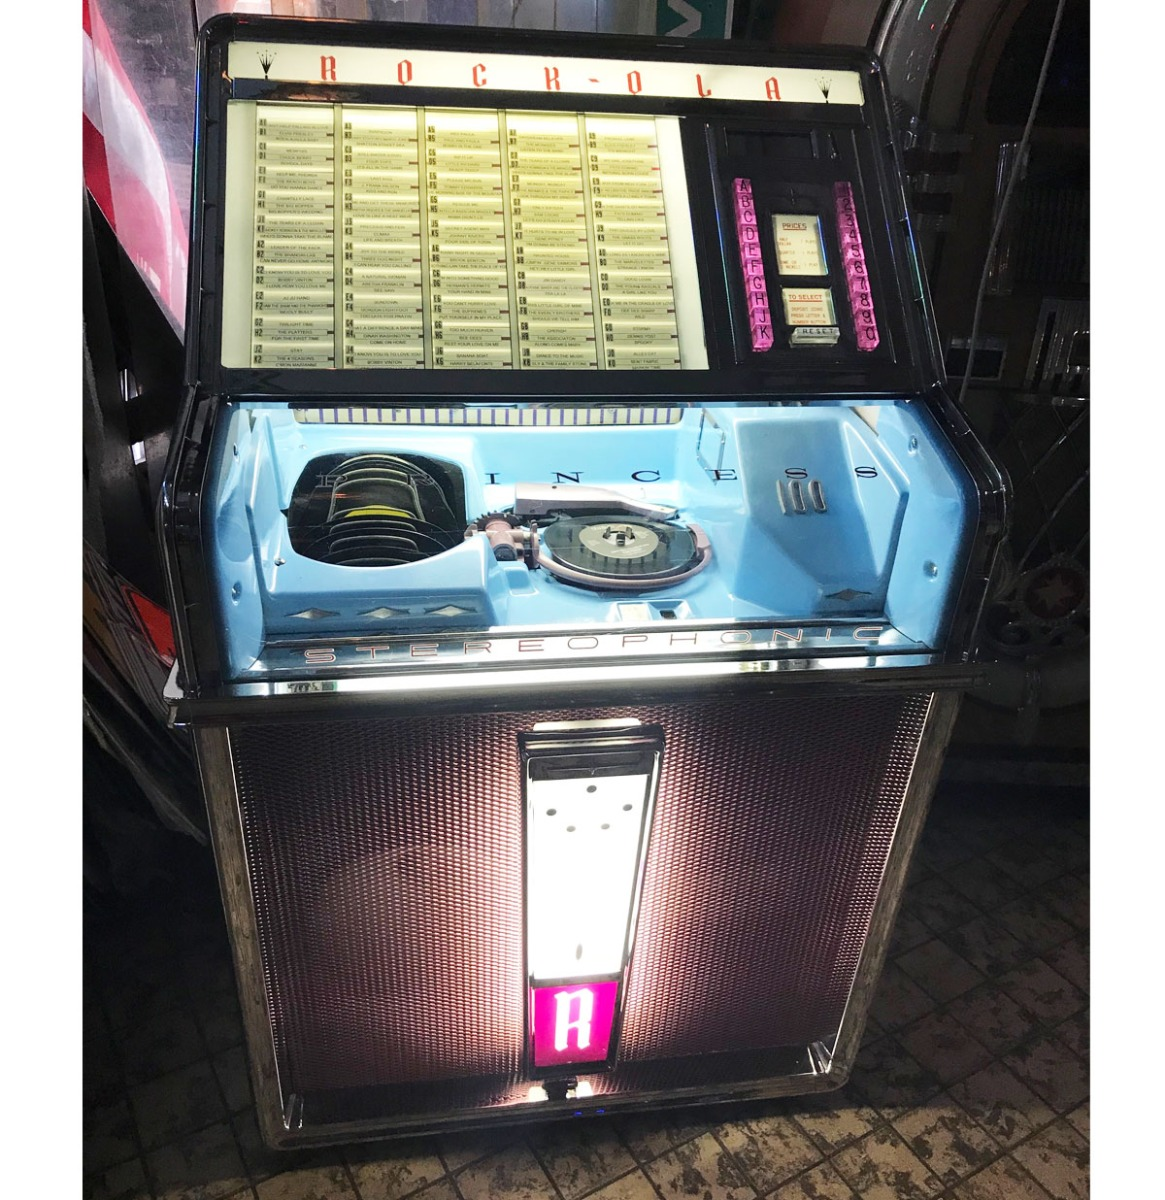 Rock-Ola 1493 Princess Jukebox 1962 - Gerestaureerd